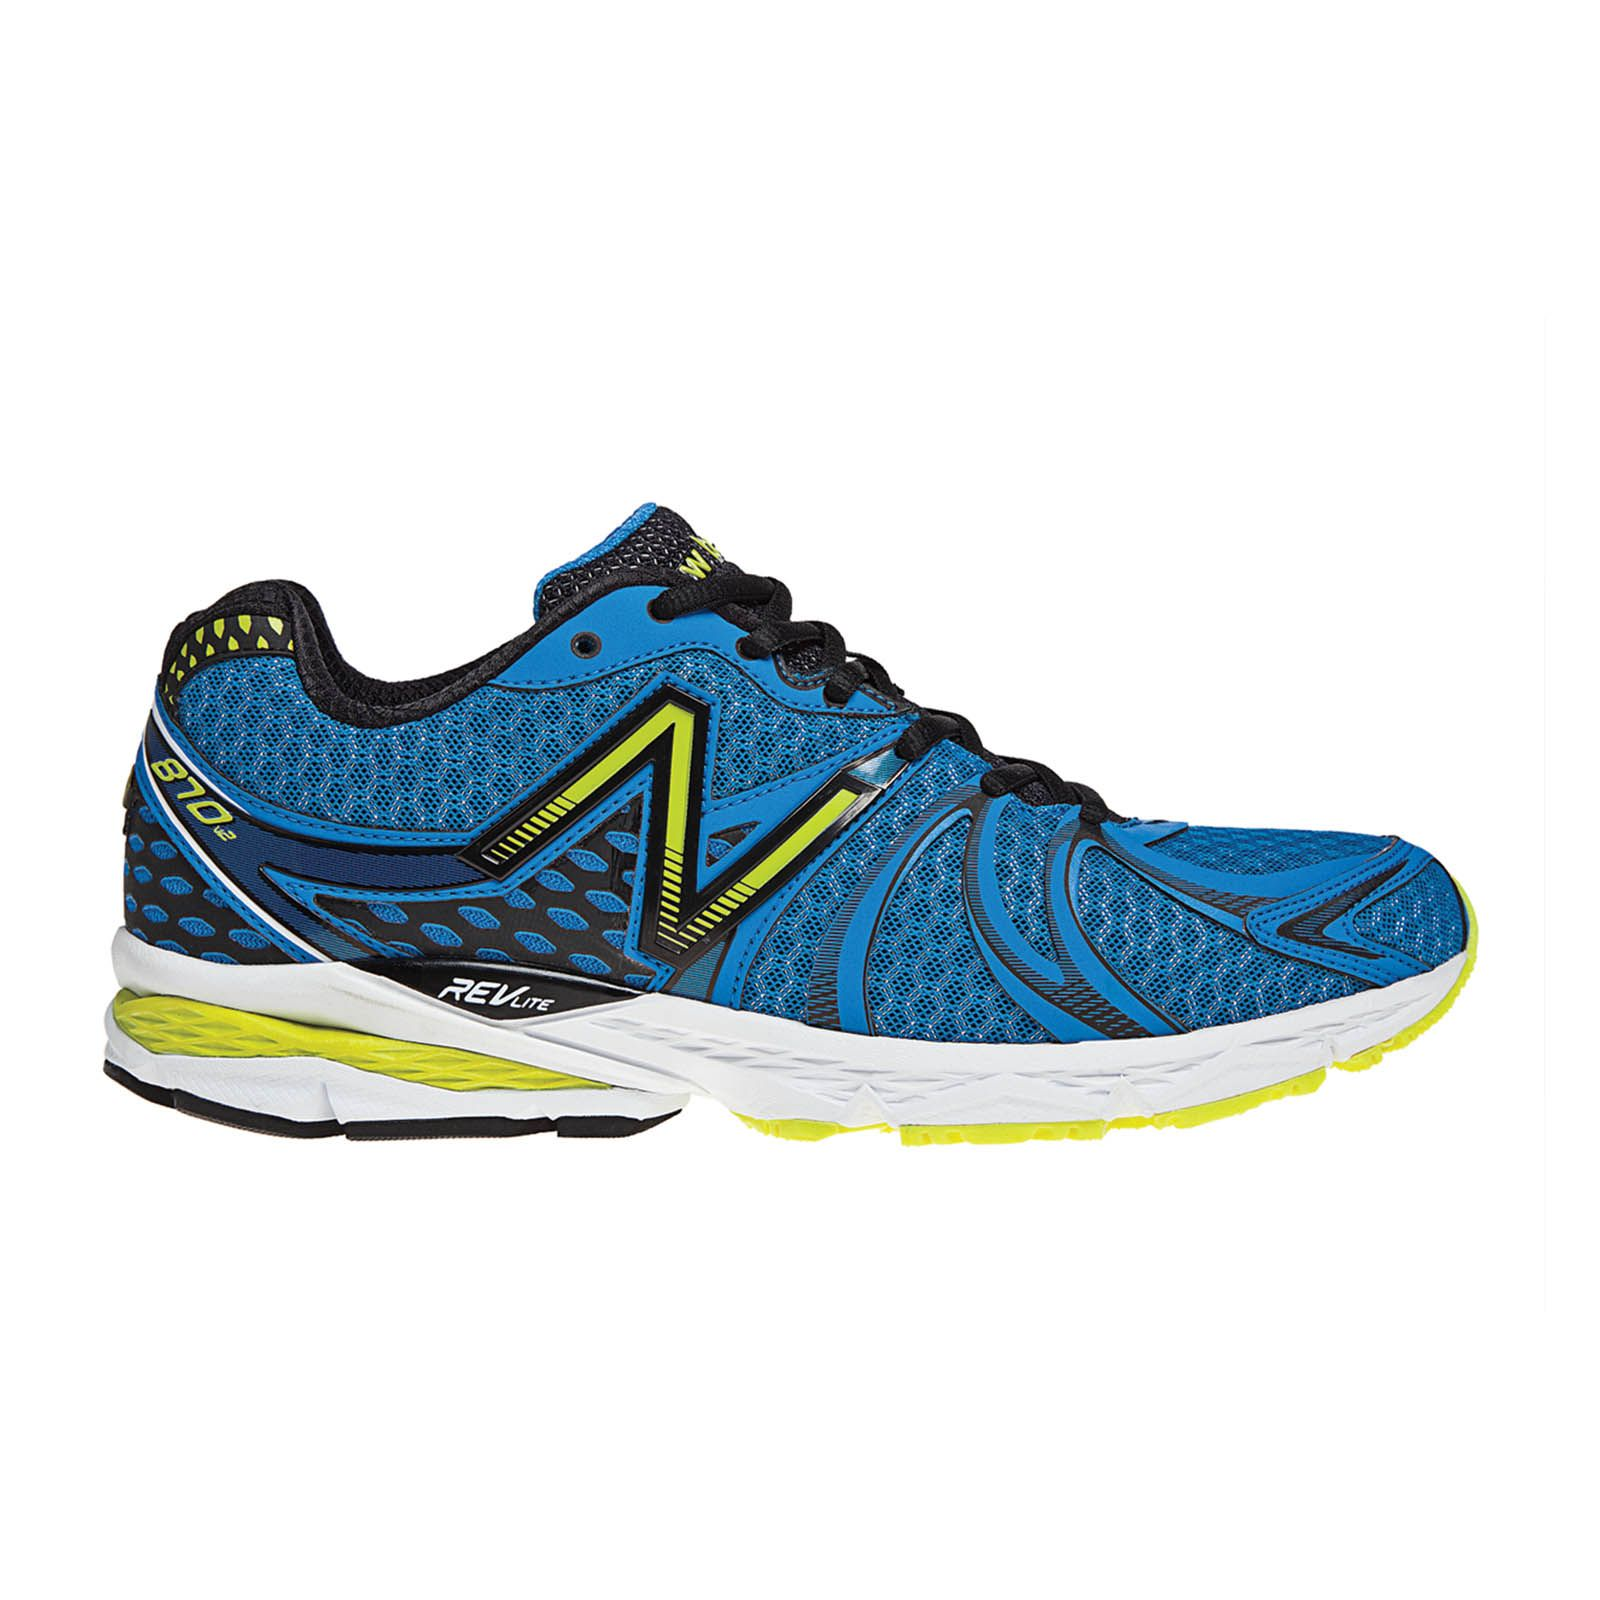 new balance m870v2 mens running shoes sweatband